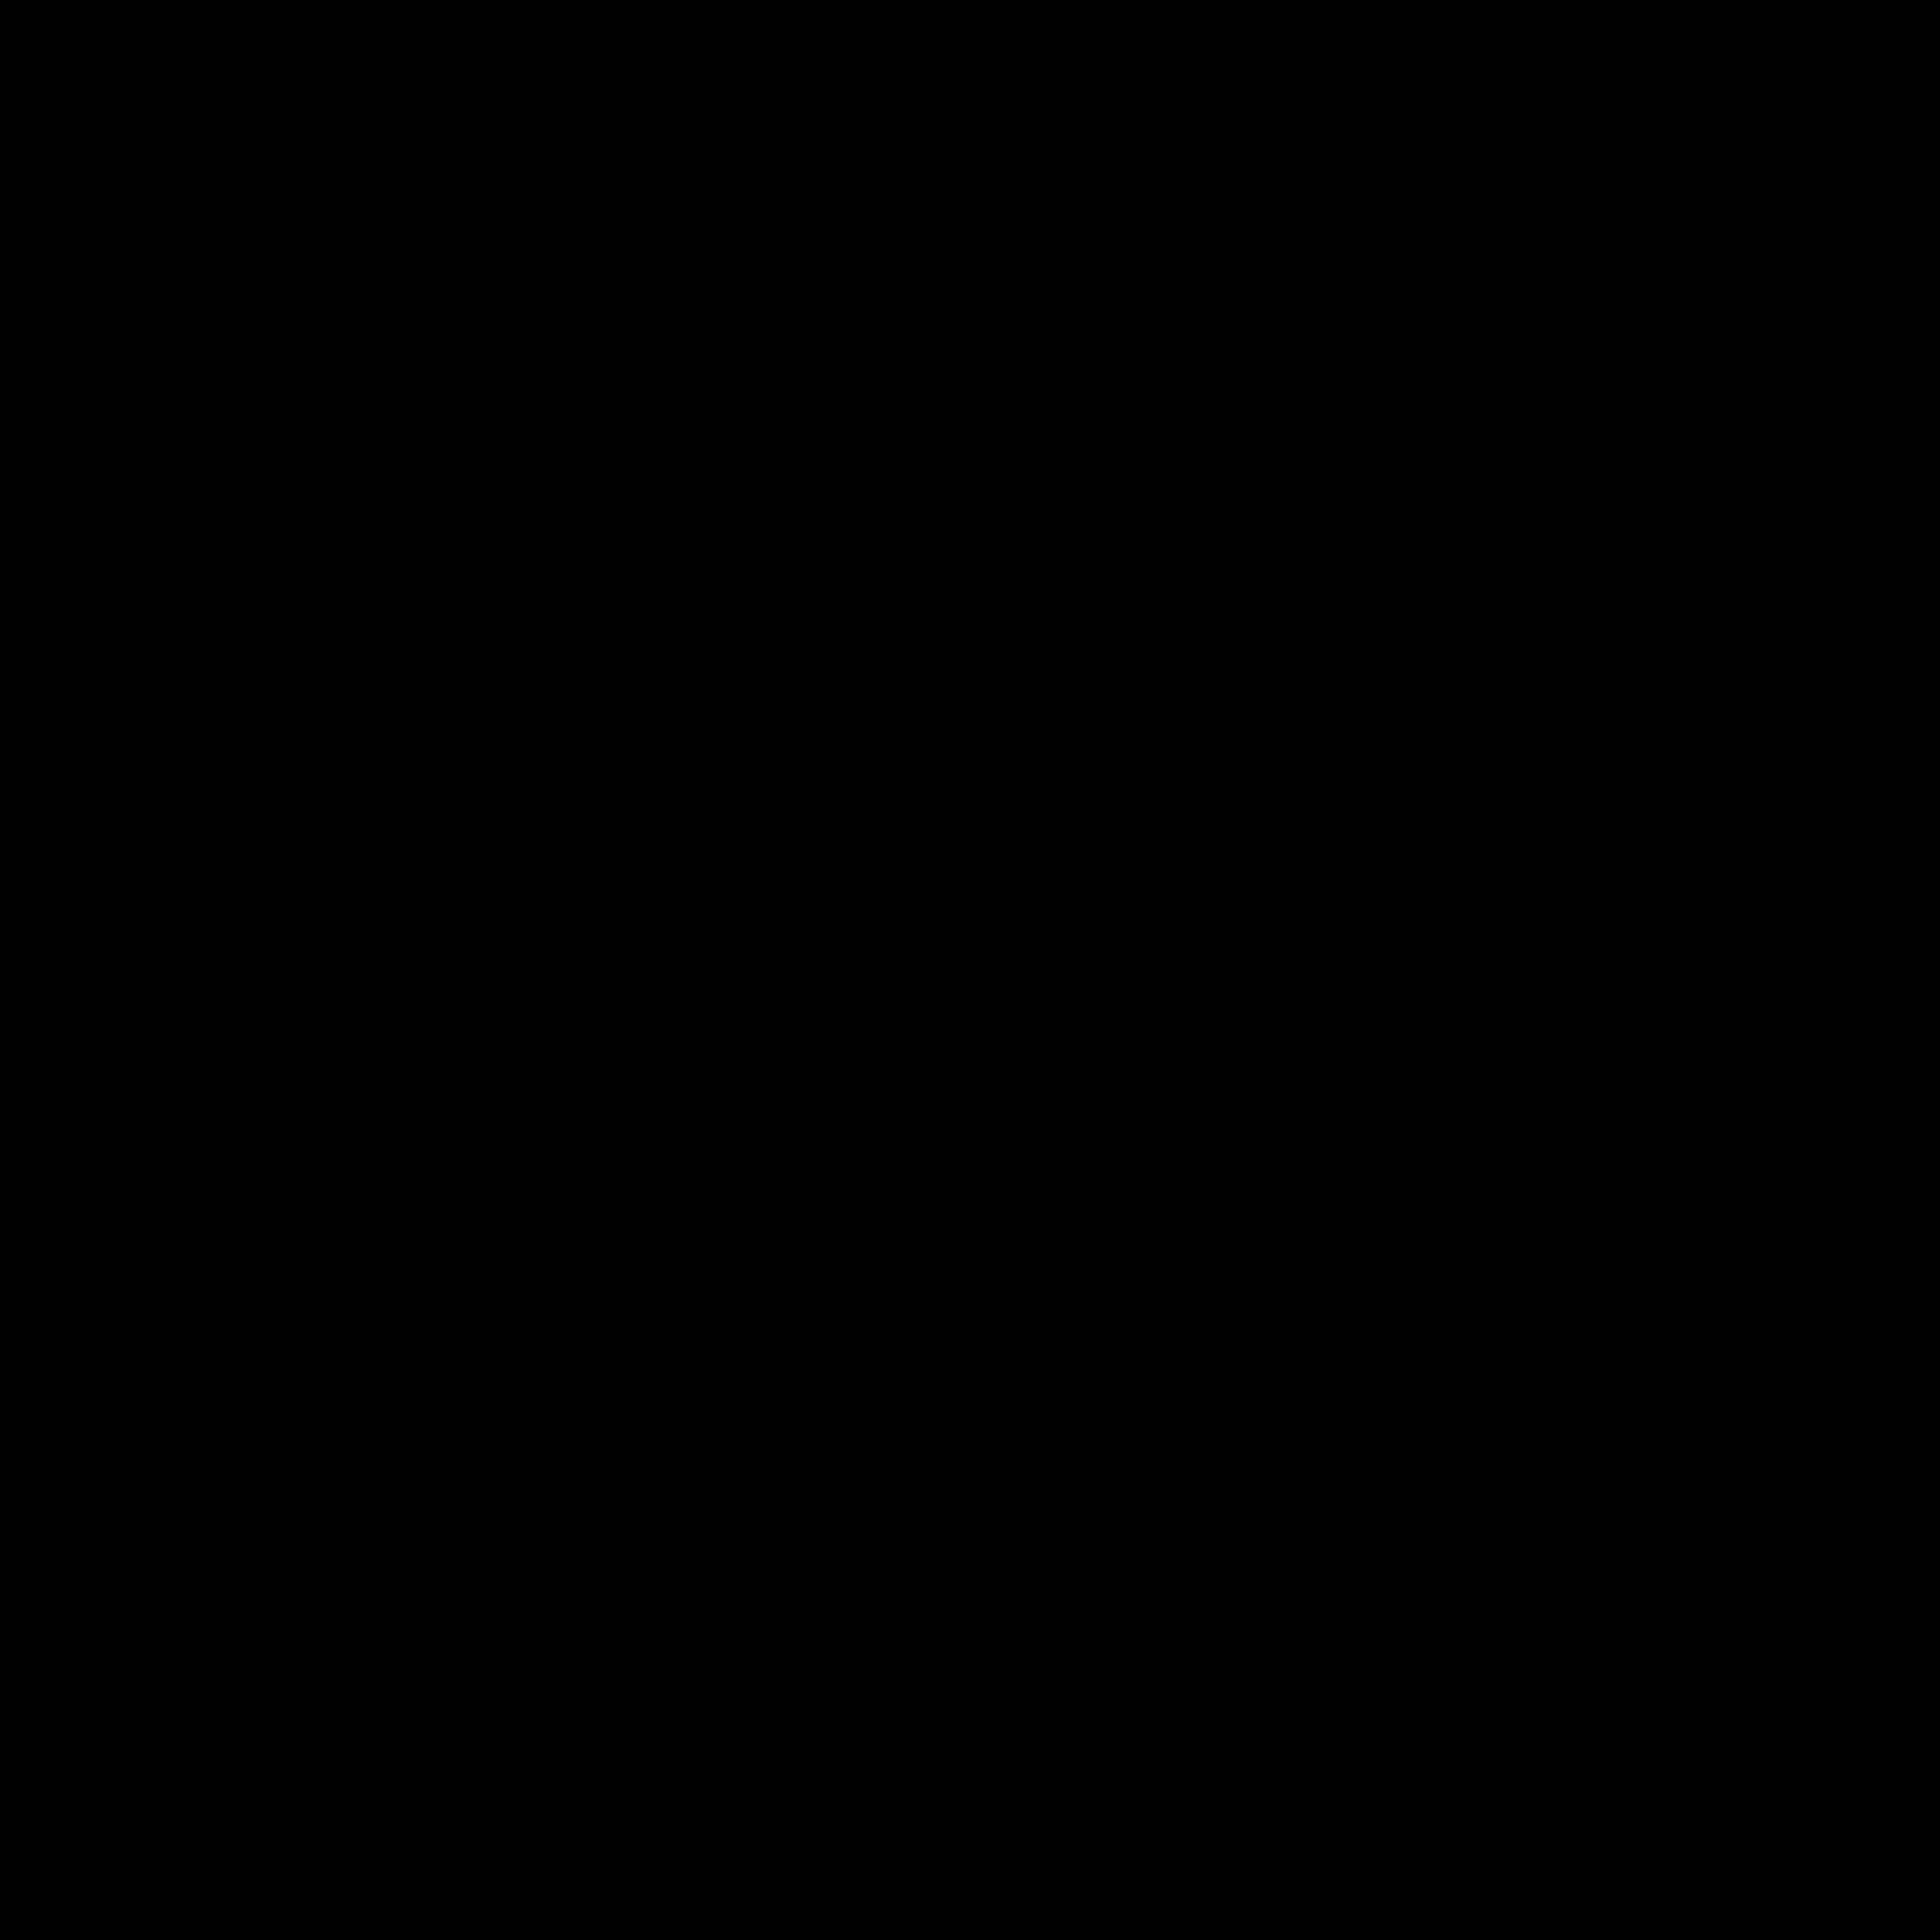 nissan logo 0 2 - Nissan Logo